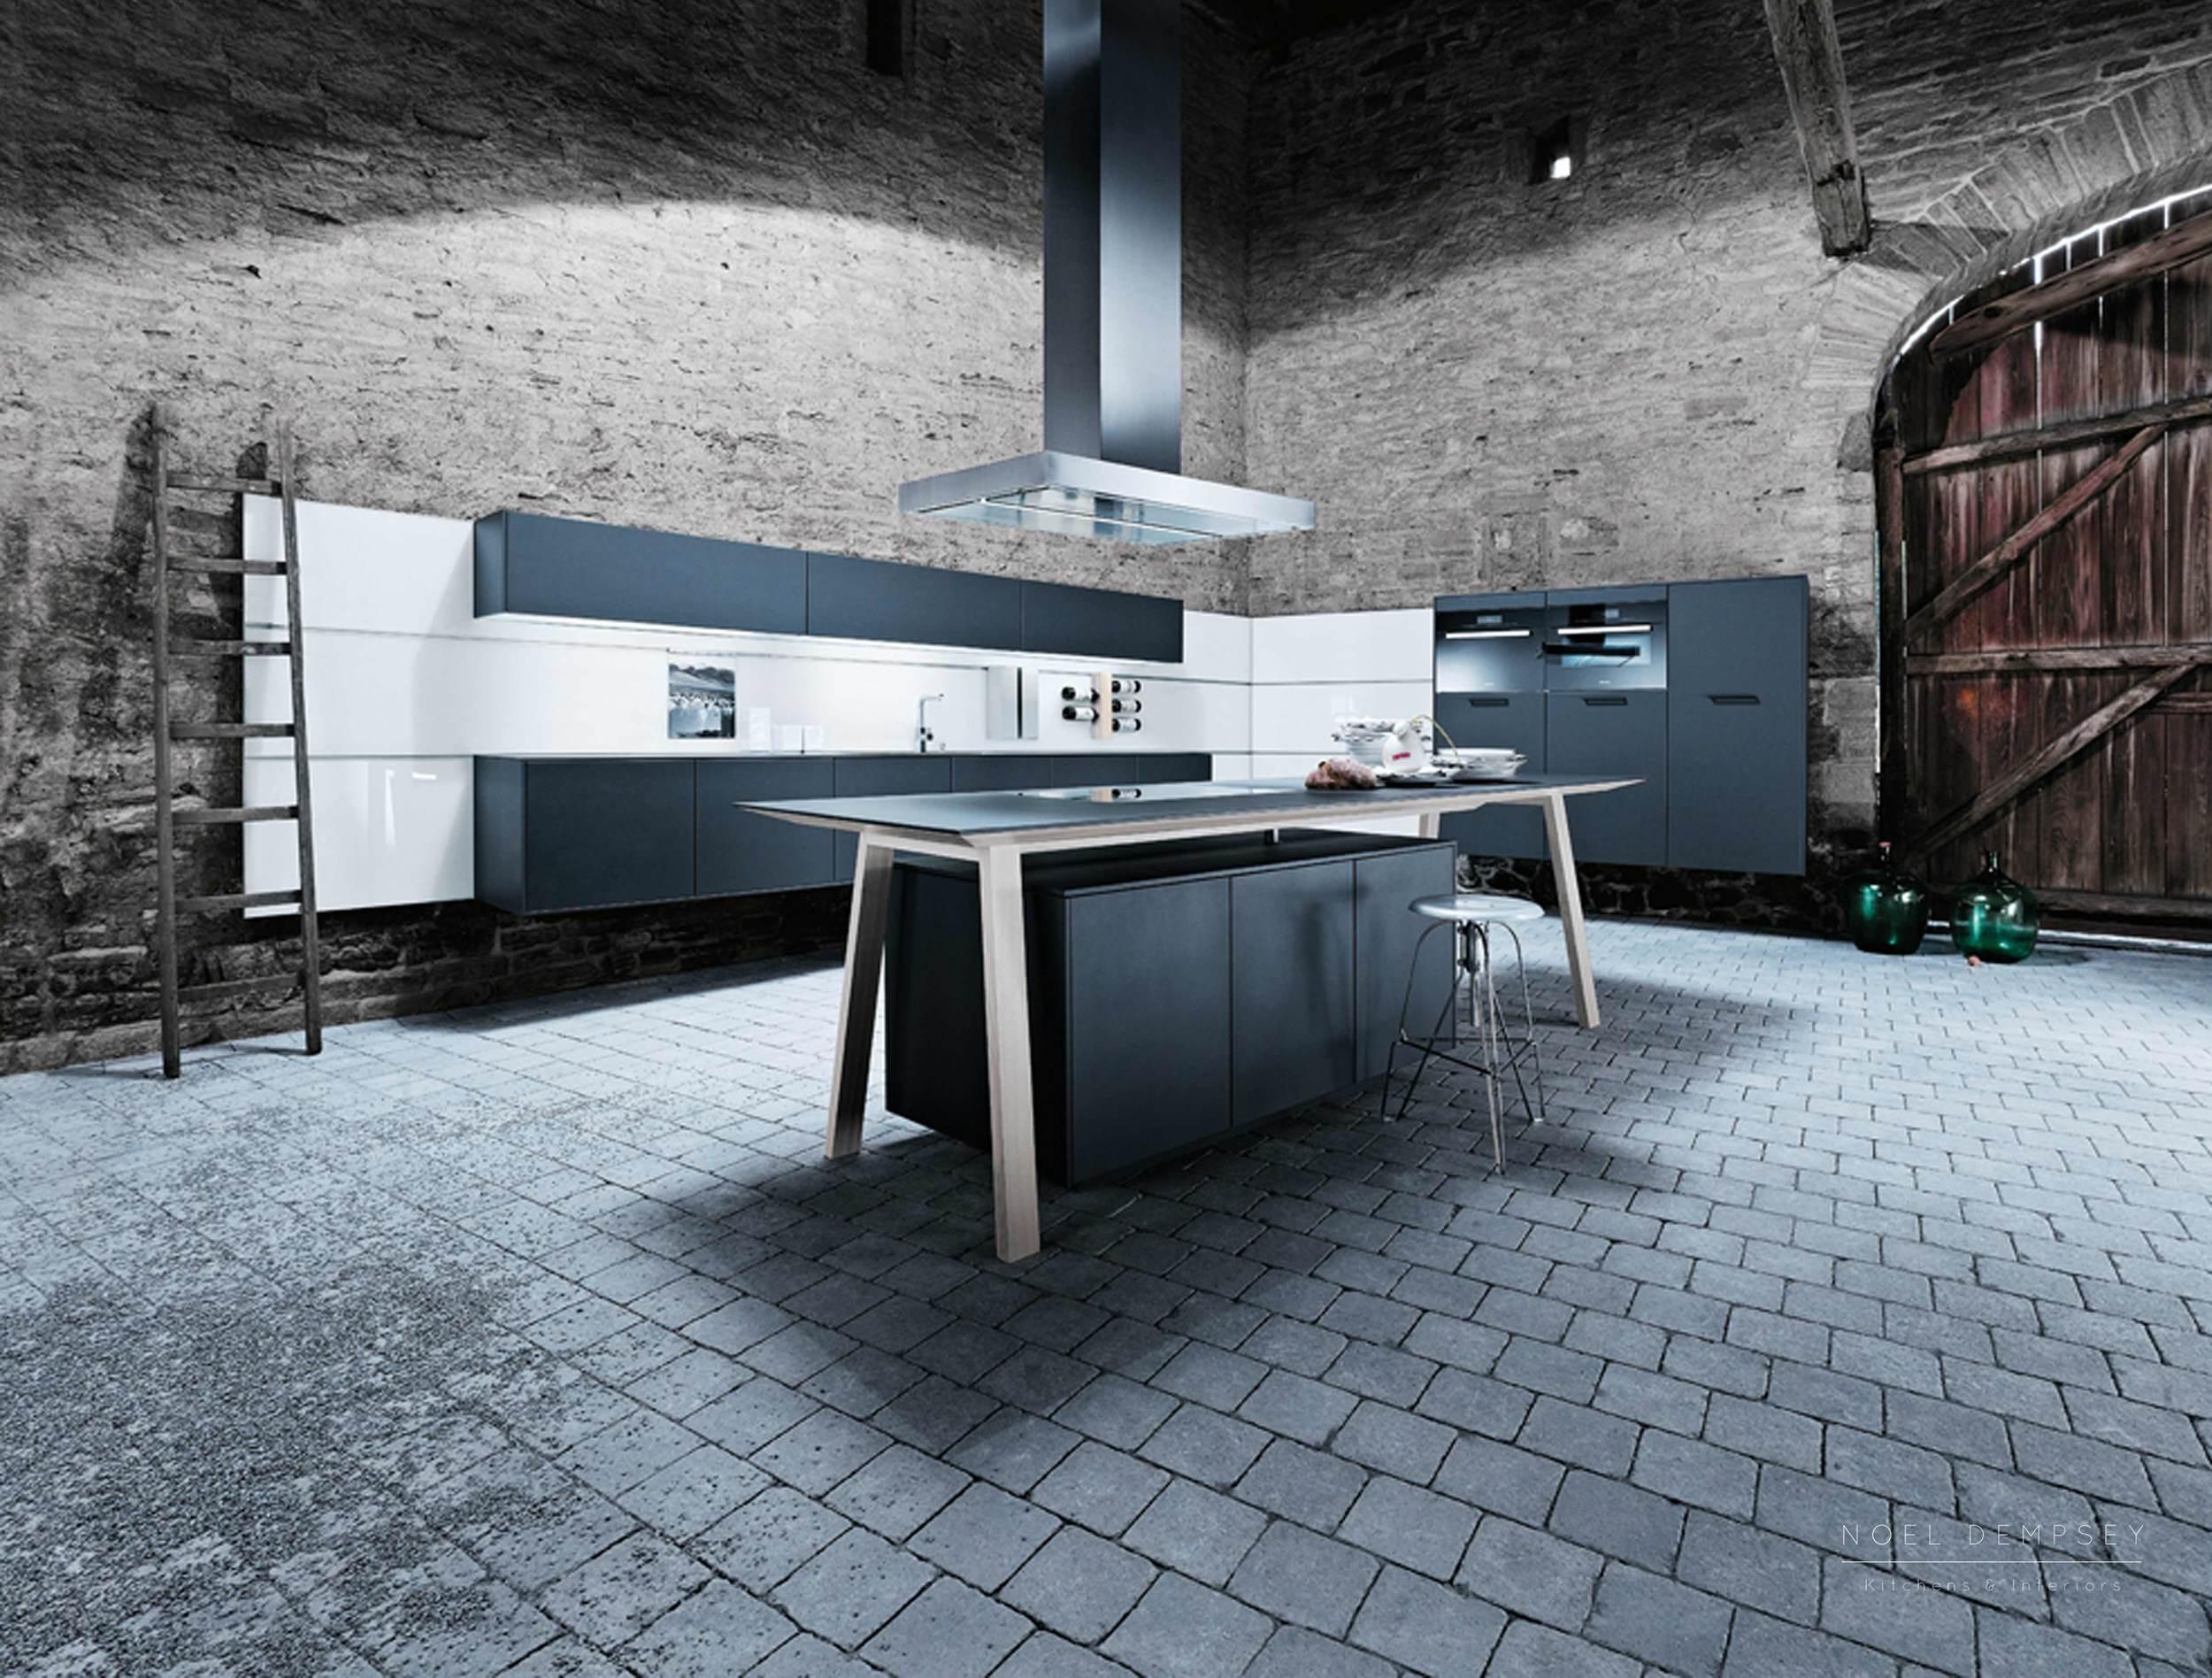 NX500-Satin-Lava-Black-German-Kitchen-1.jpg